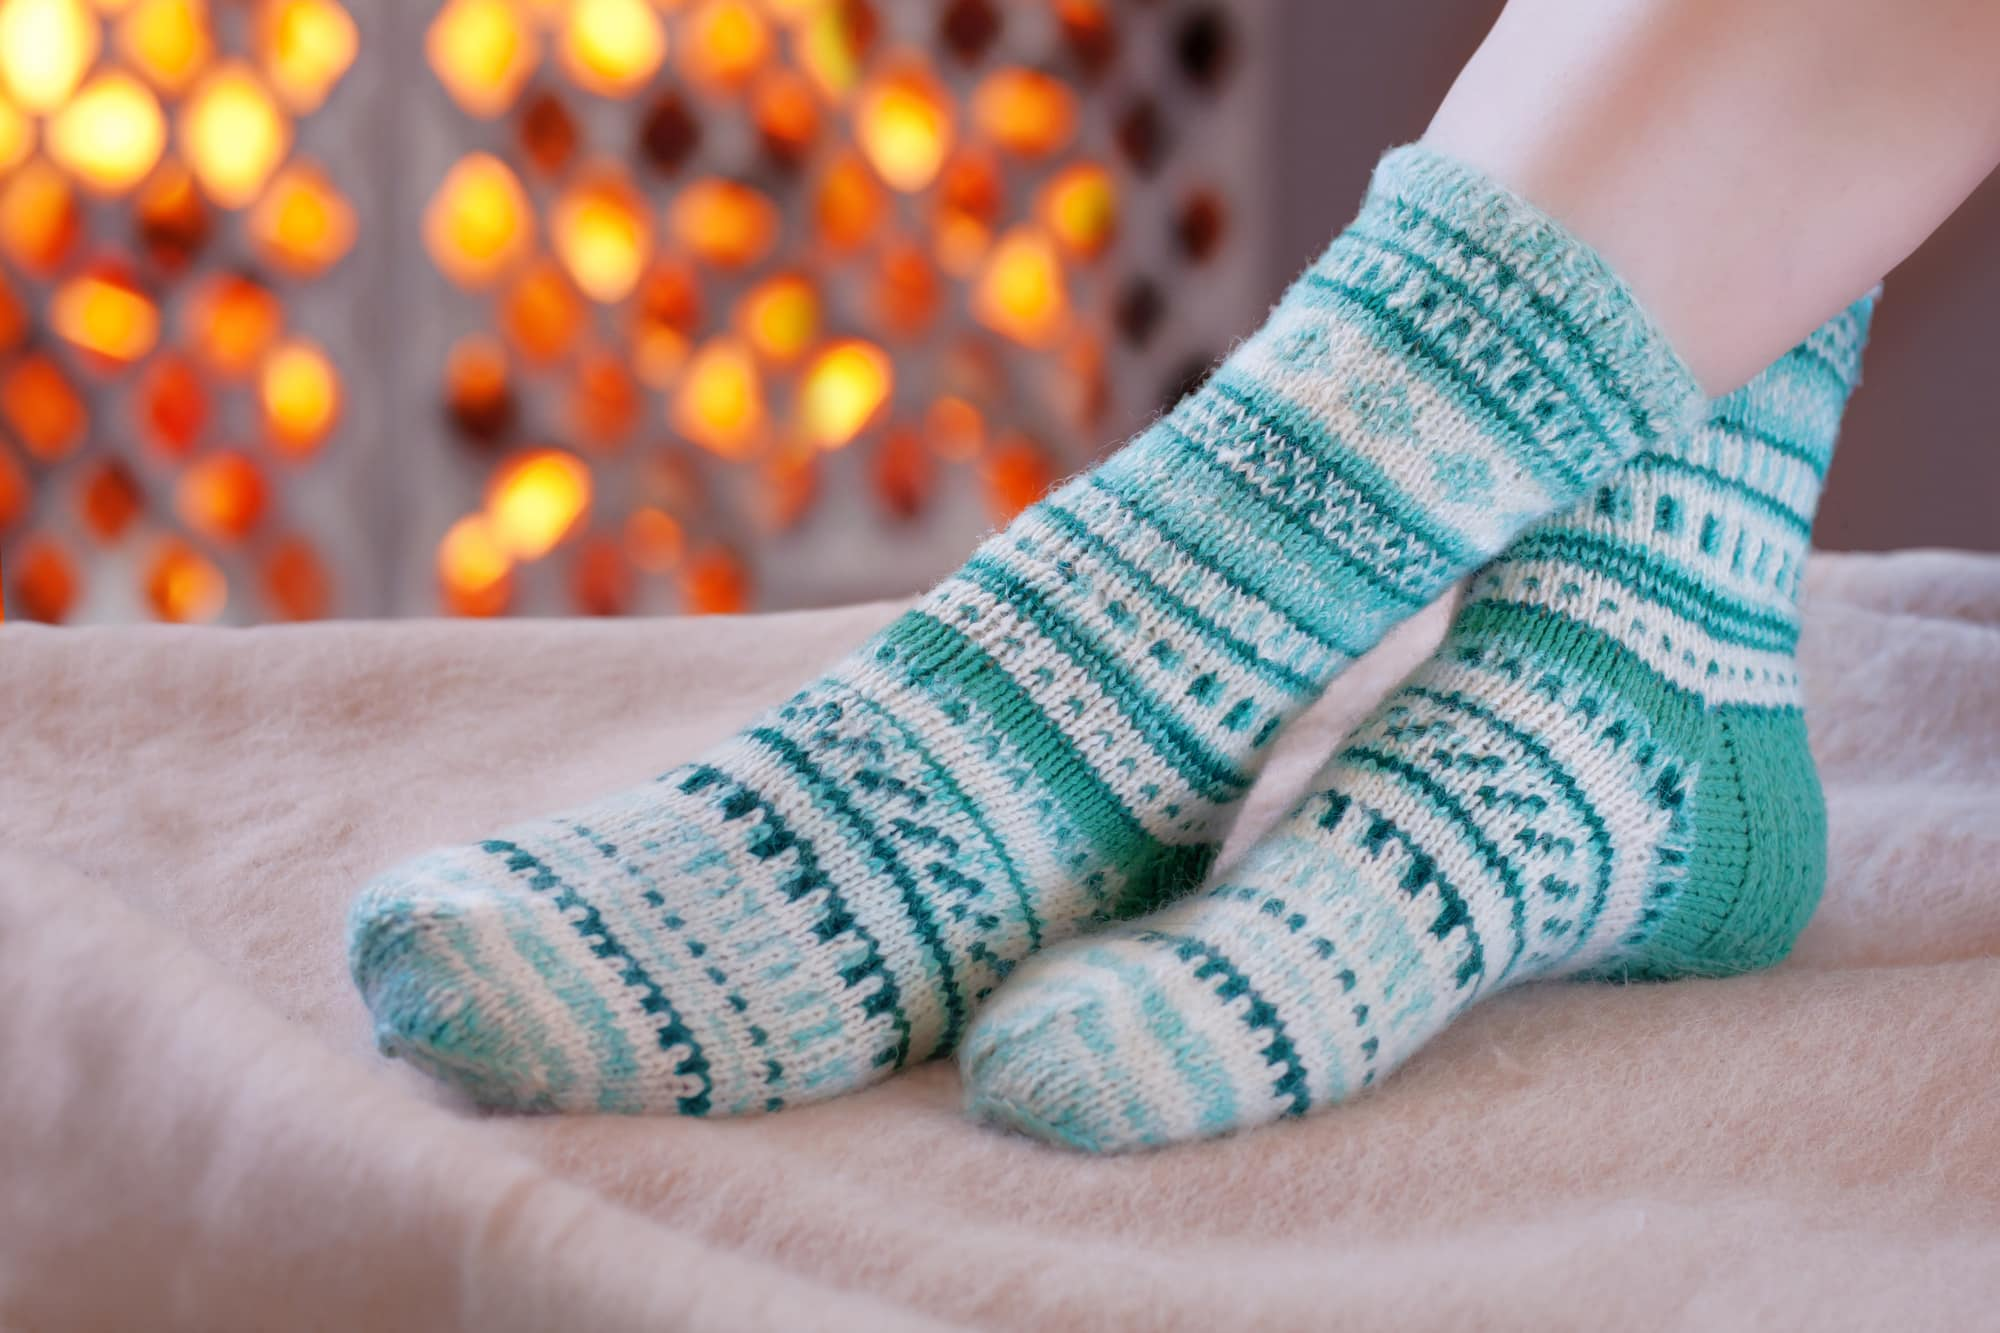 Woolen socks for sleeping